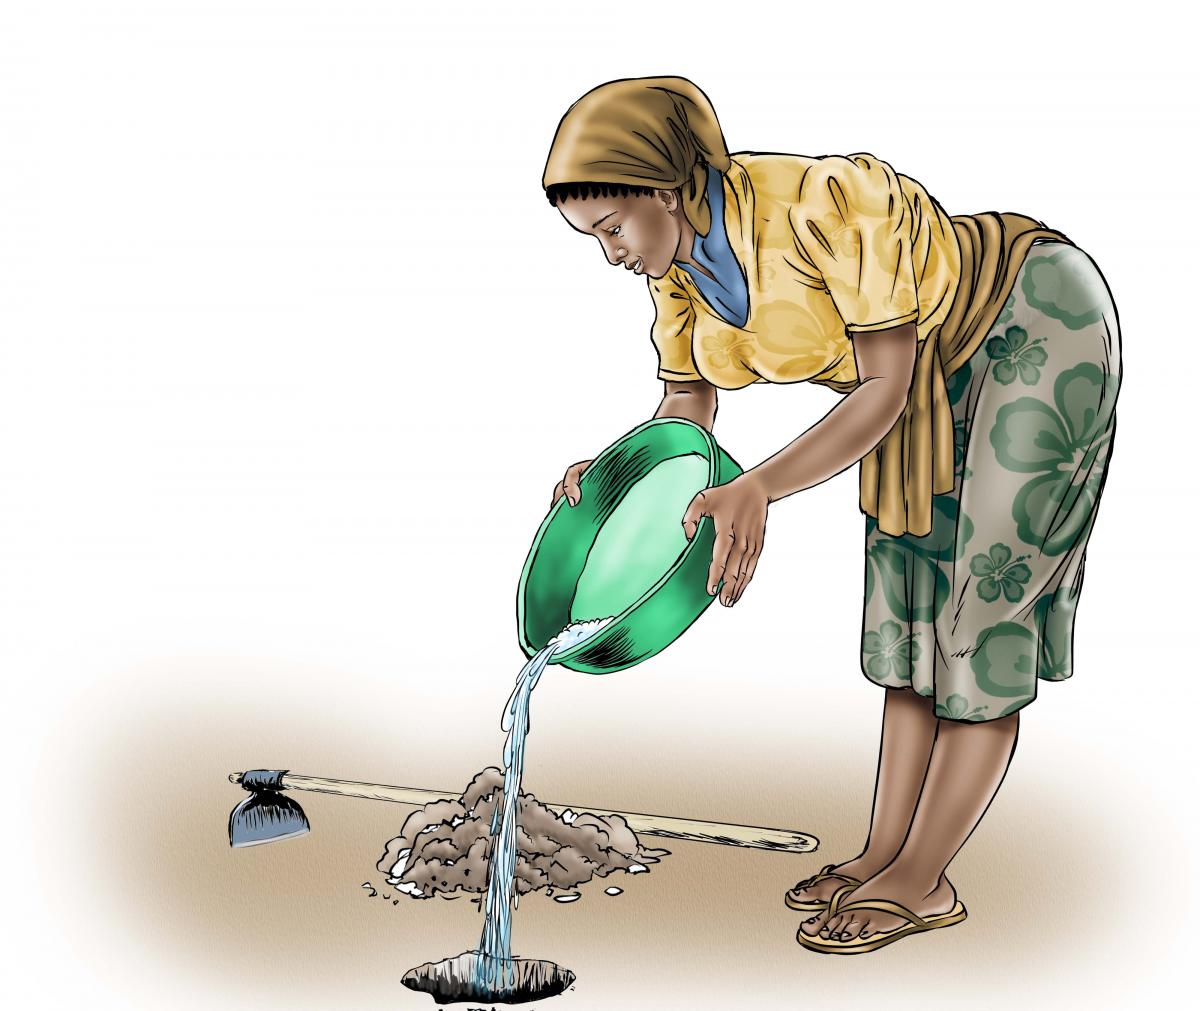 Sanitation - Depositing waste in hole - 03C - Sierra Leone